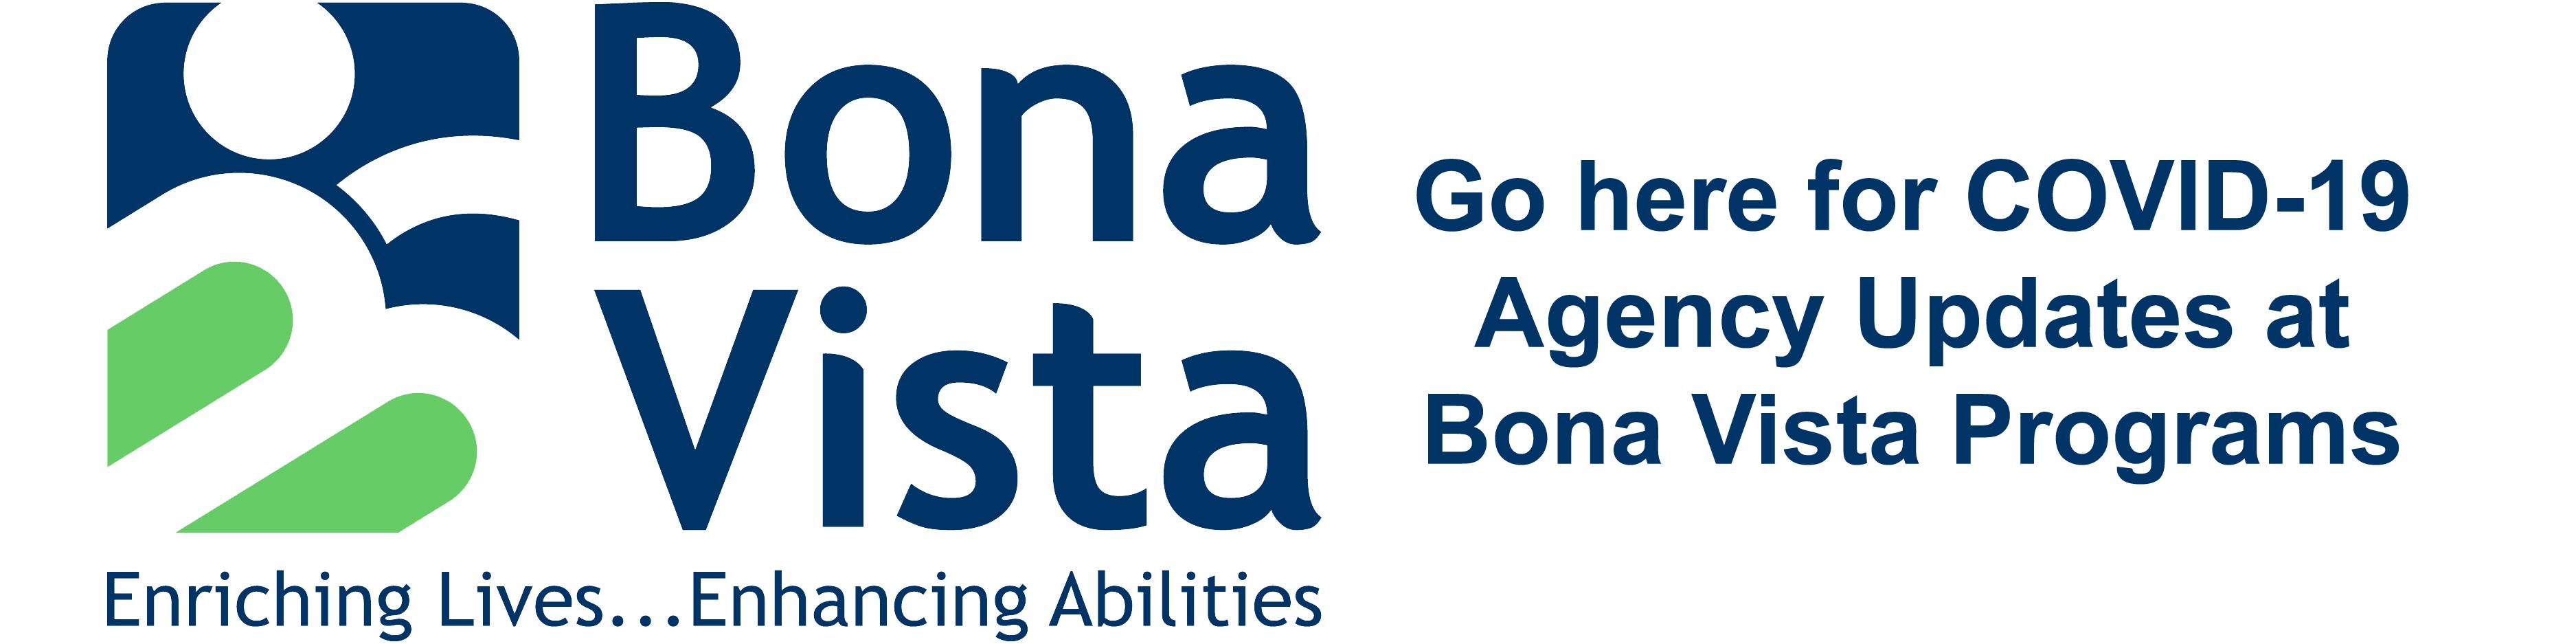 BONA VISTA COVID 19 Agency Updates